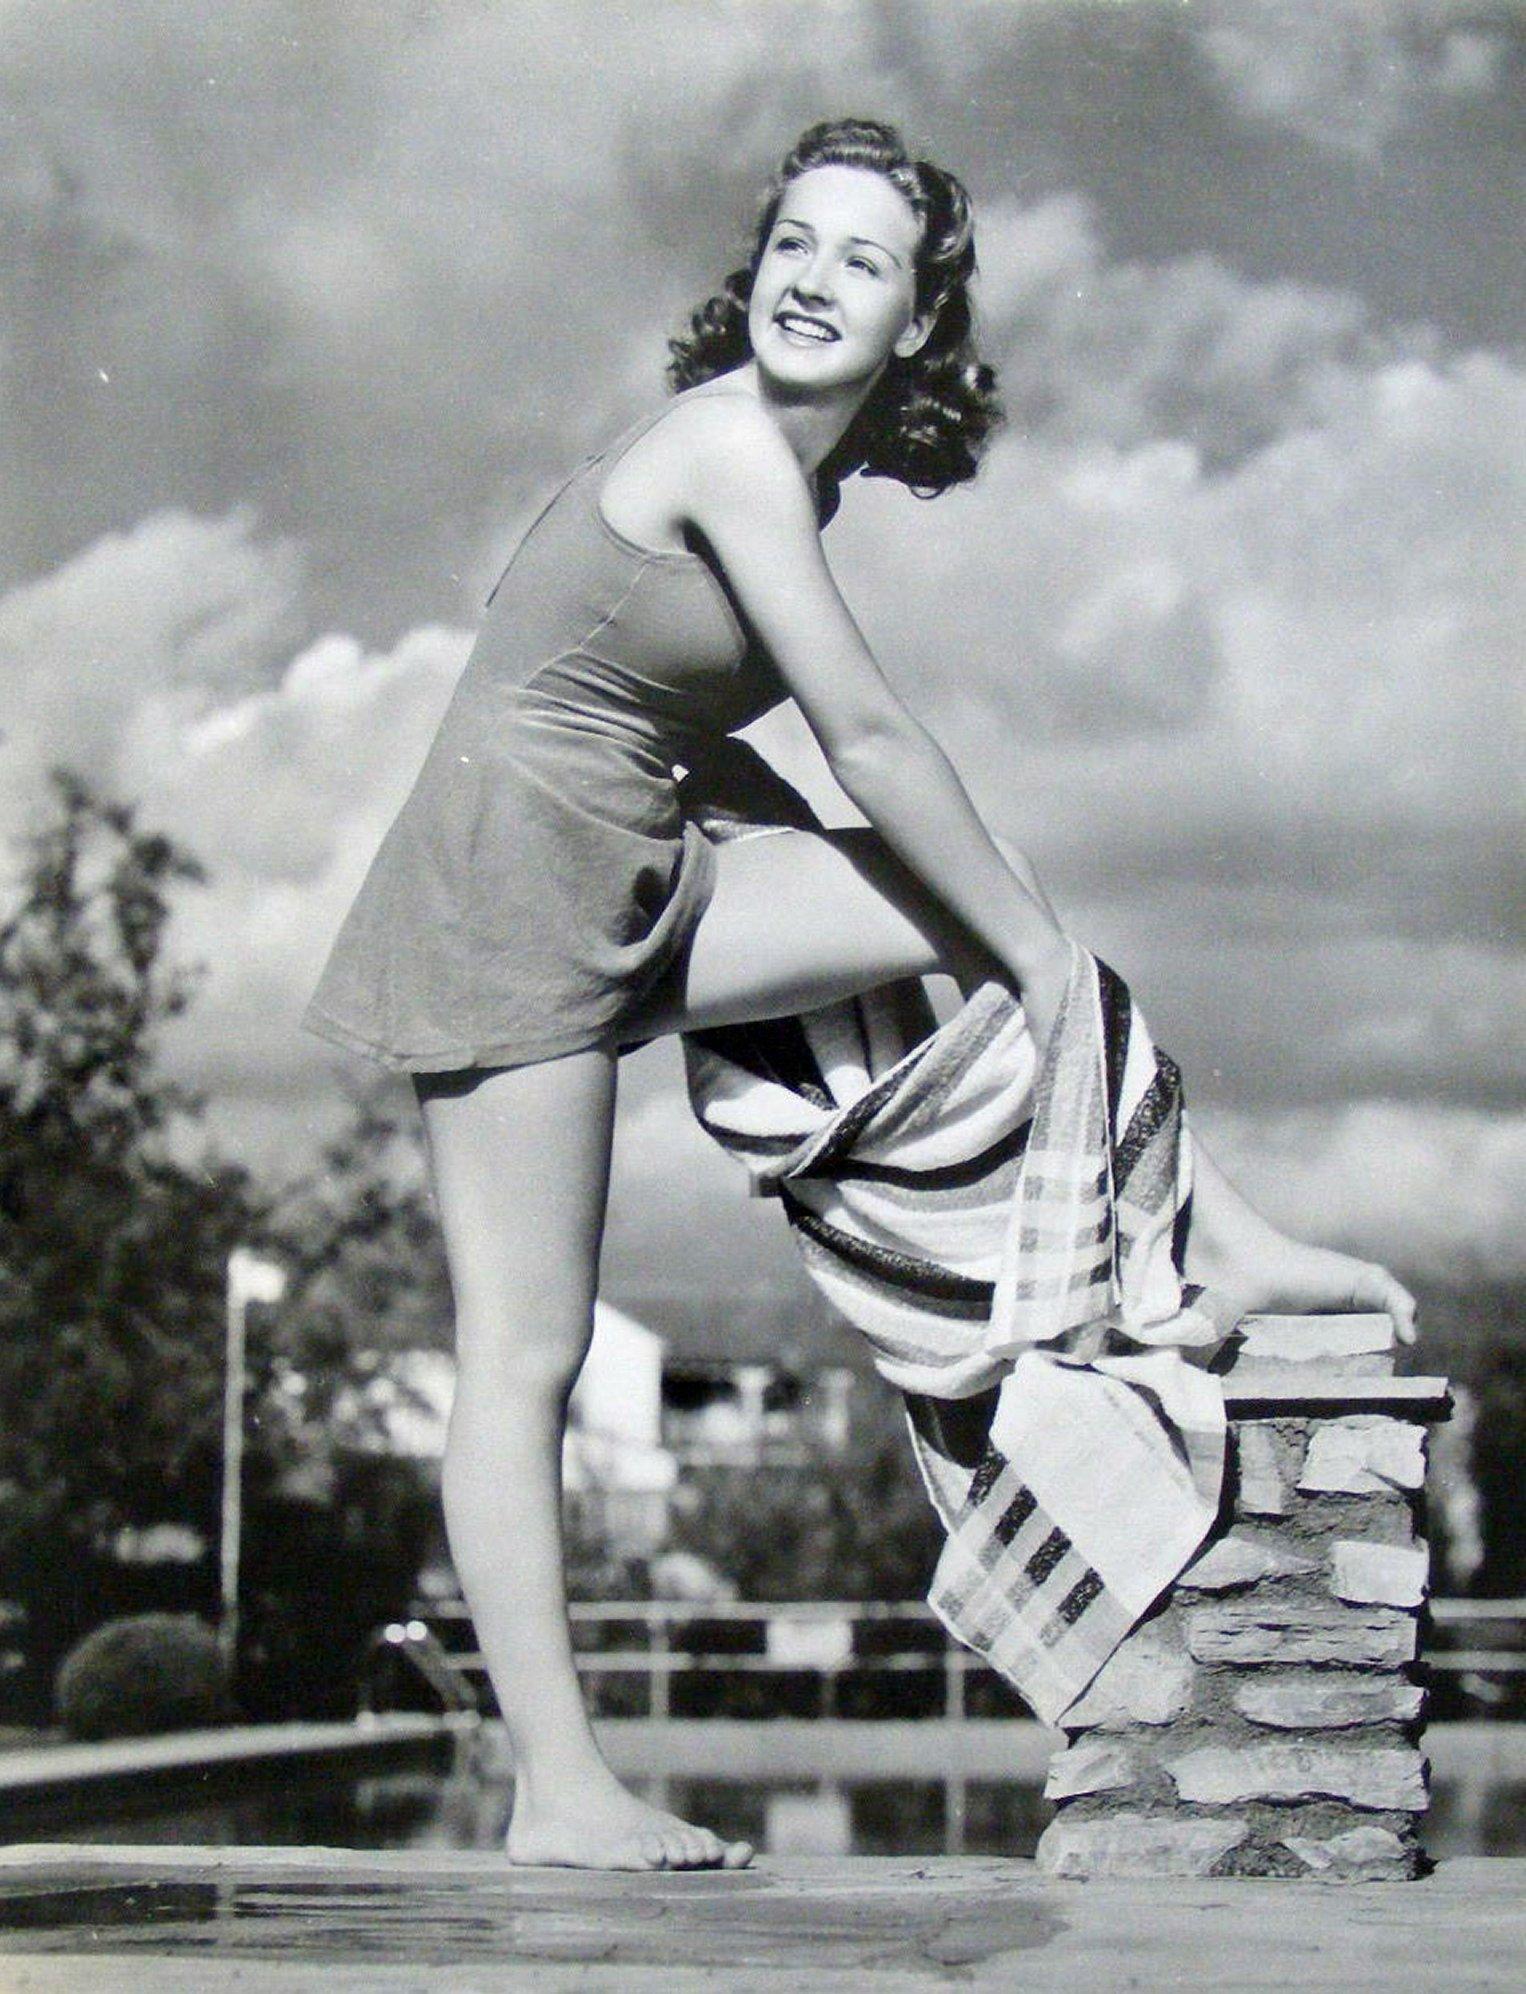 Amelia Heinle Adult pictures Phyllida Law (born 1932),Karen Alexander USA 1 1995